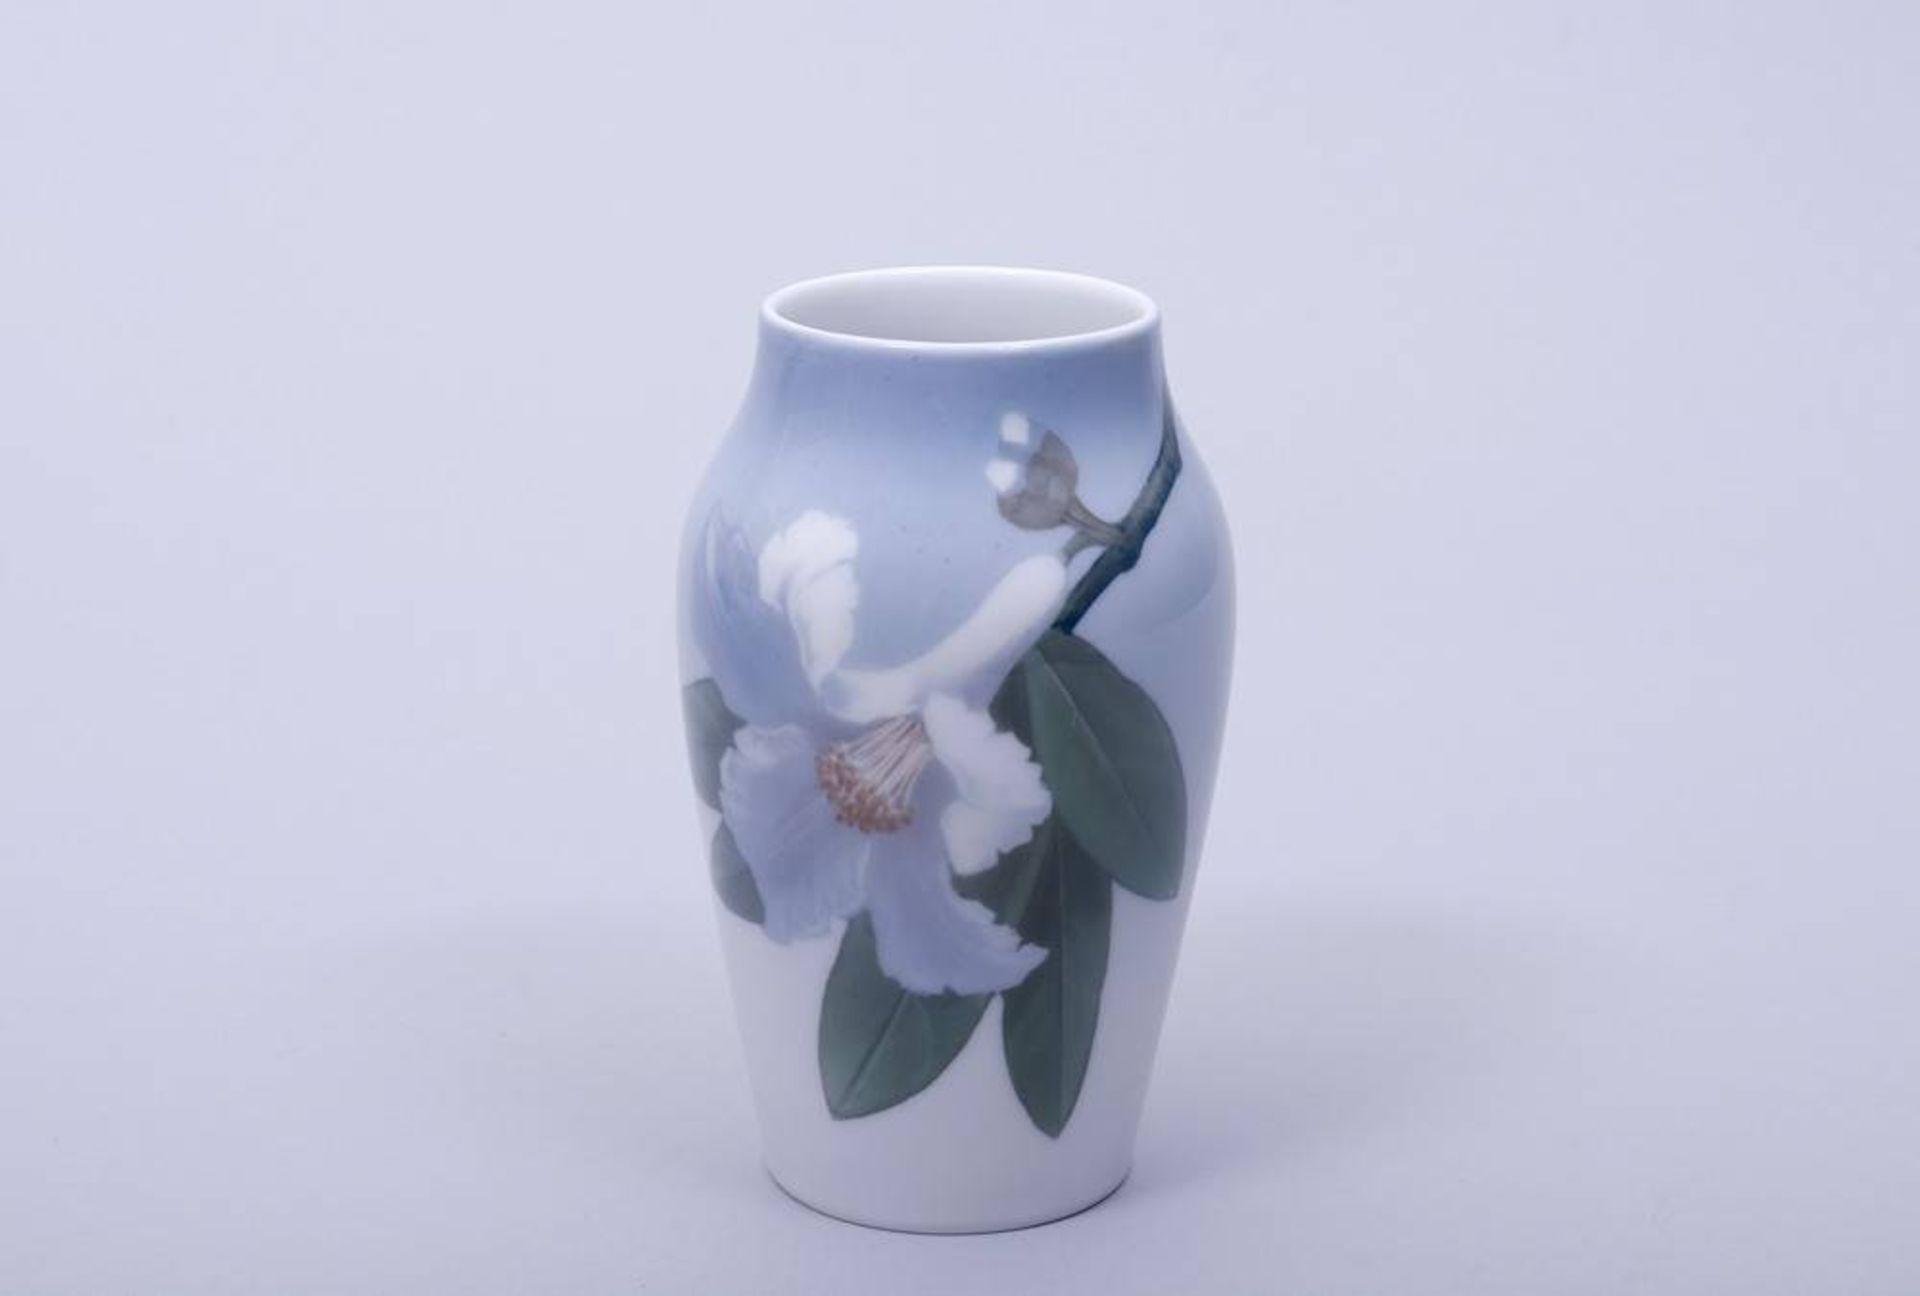 Kleine Vase, Royal Kopenhagen, 20. Jhdt.Porzellan, polychrome Unterglasurmalerei, ovoider Korpus mit